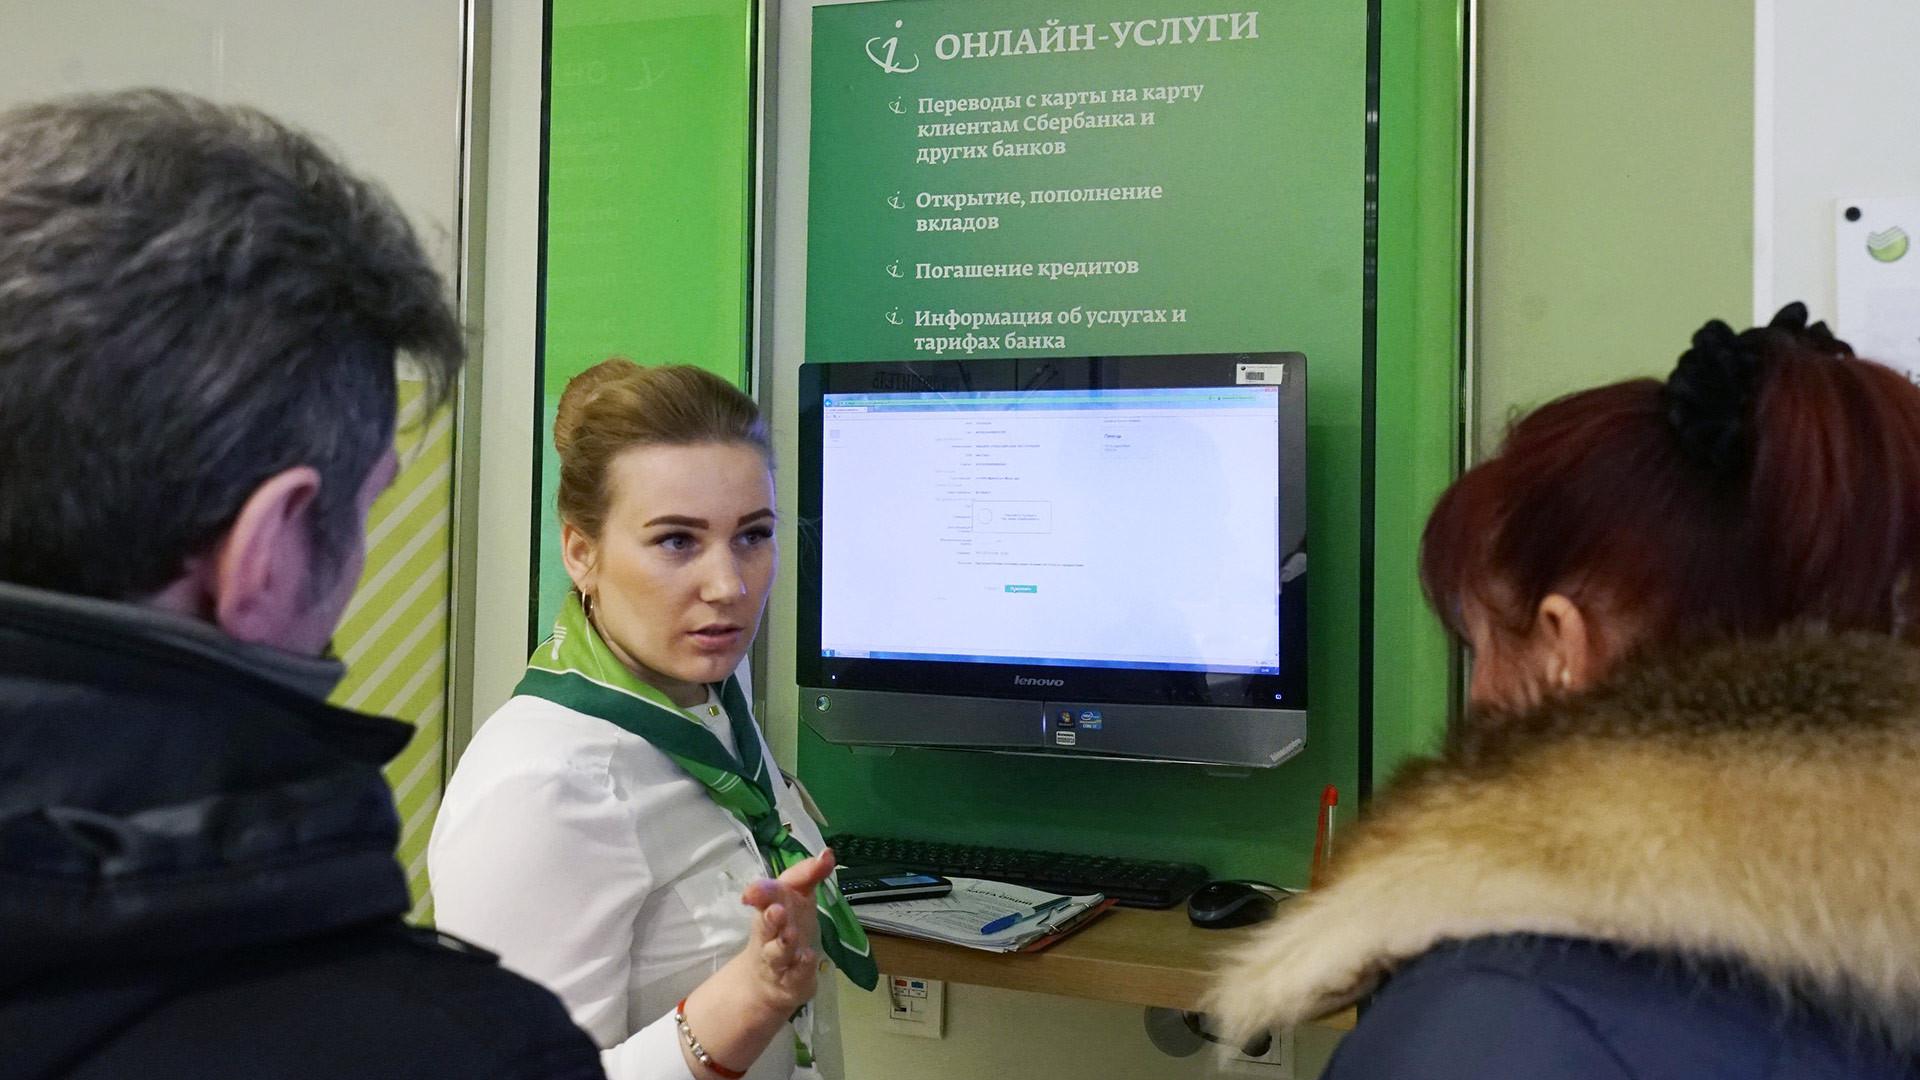 <p>Фото &copy; РИА Новости/Игорь Зарембо&nbsp;</p>